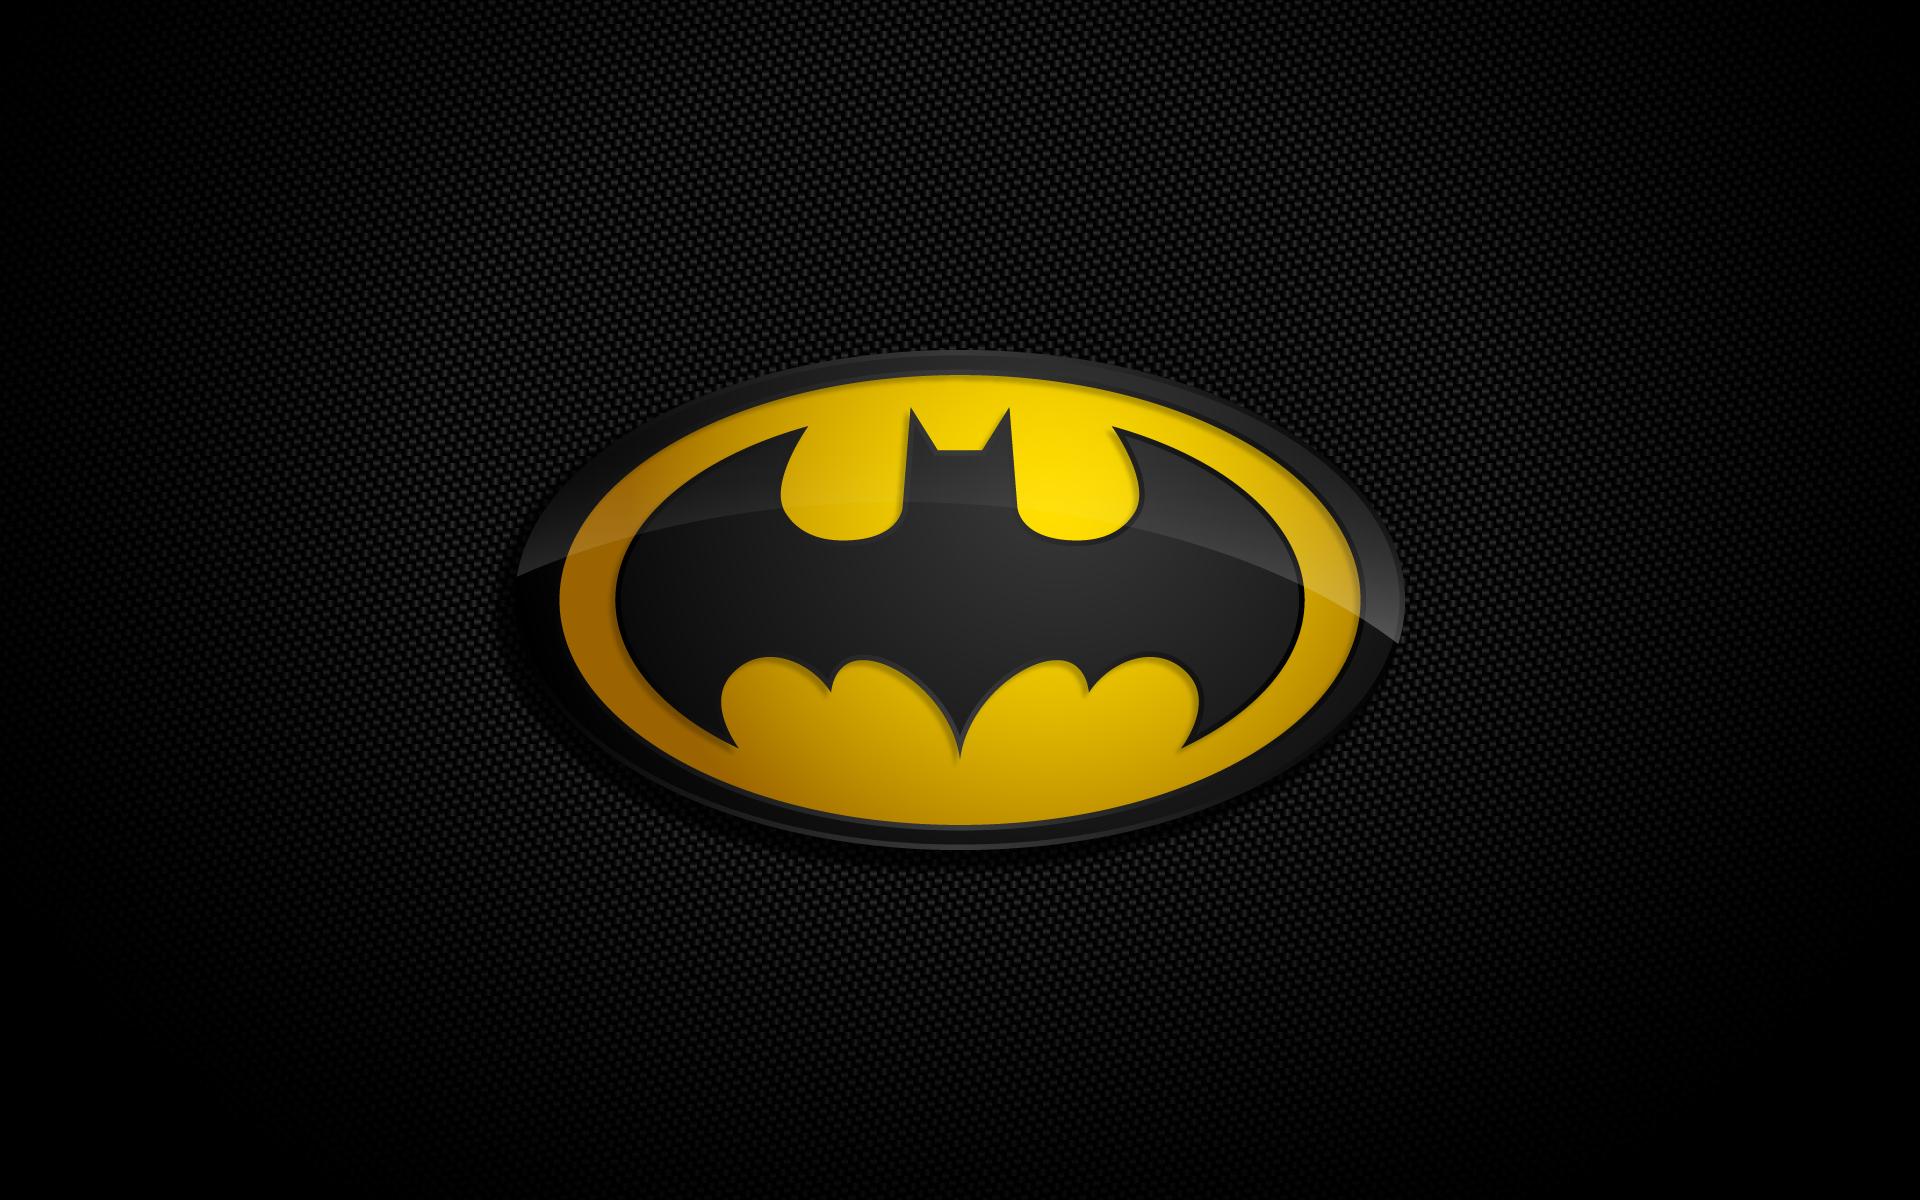 Superhero Logo Wallpapers 1920x1200